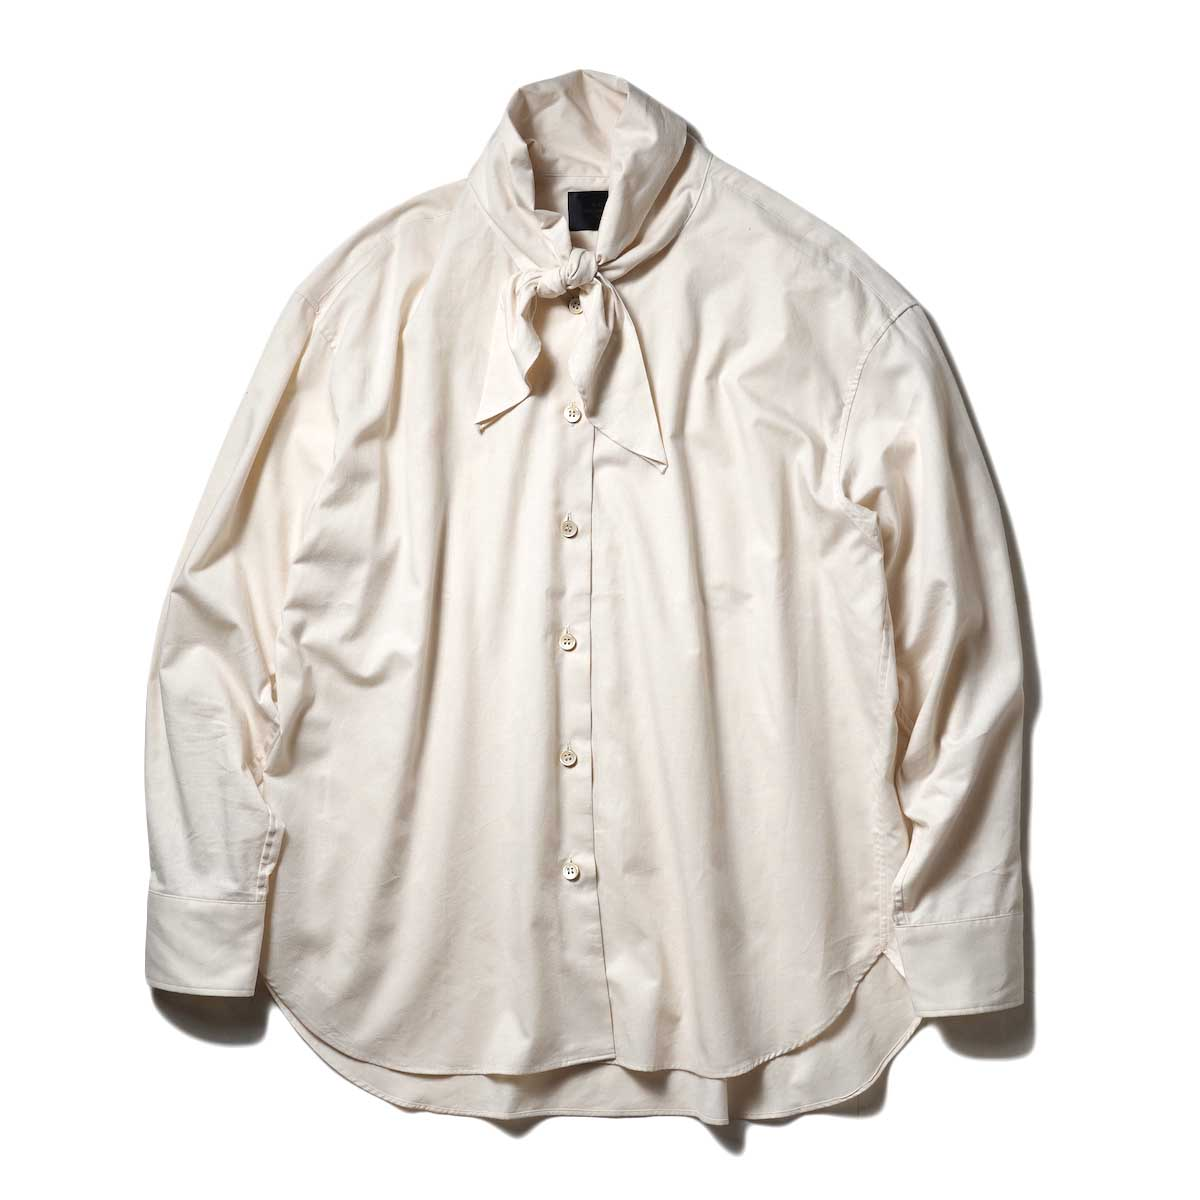 UNUSED / US2105 Ribbon Tie Shirt (Beige)